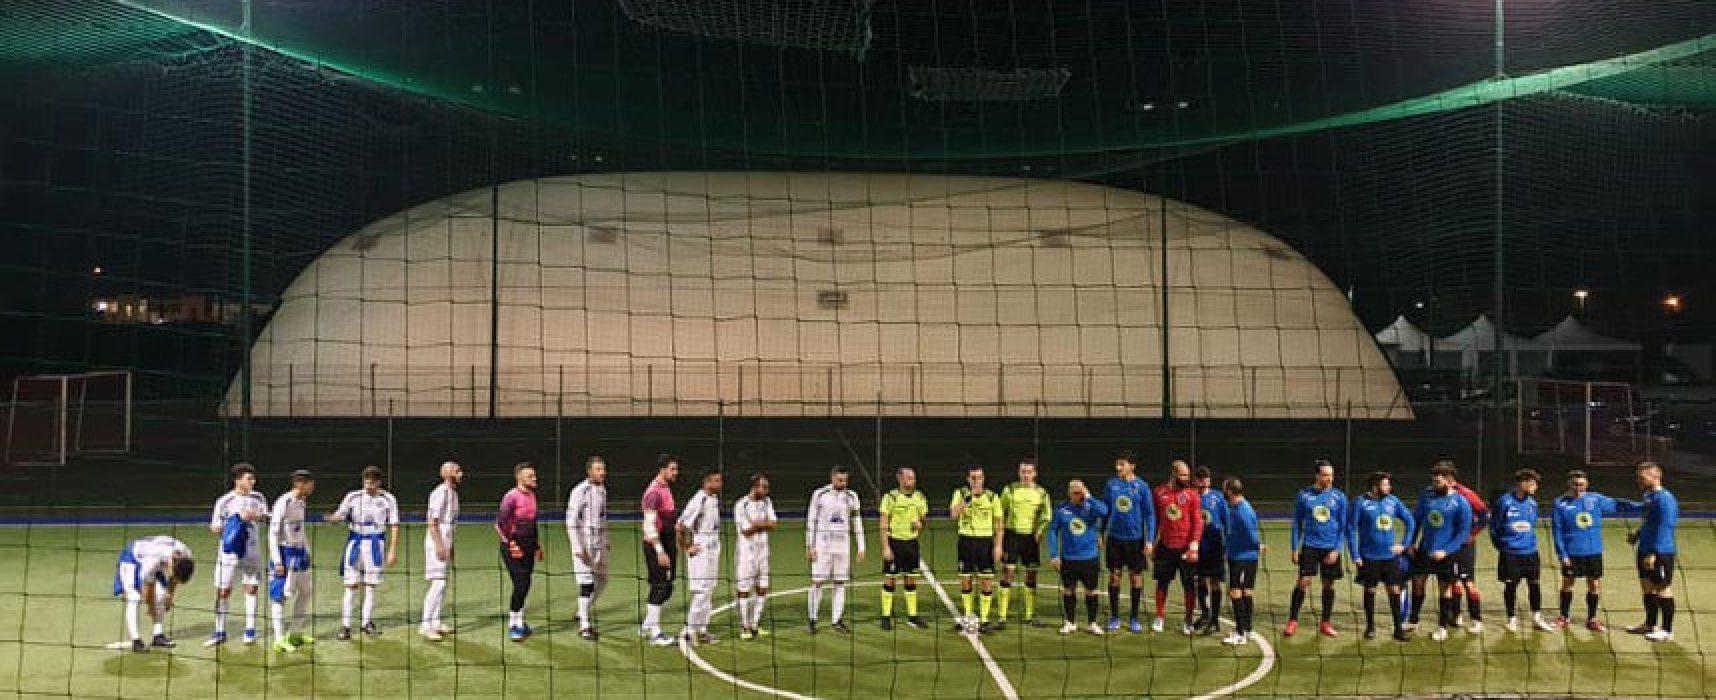 Futbol Cinco, pesante sconfitta casalinga contro il Futsal Monte Sant'Angelo